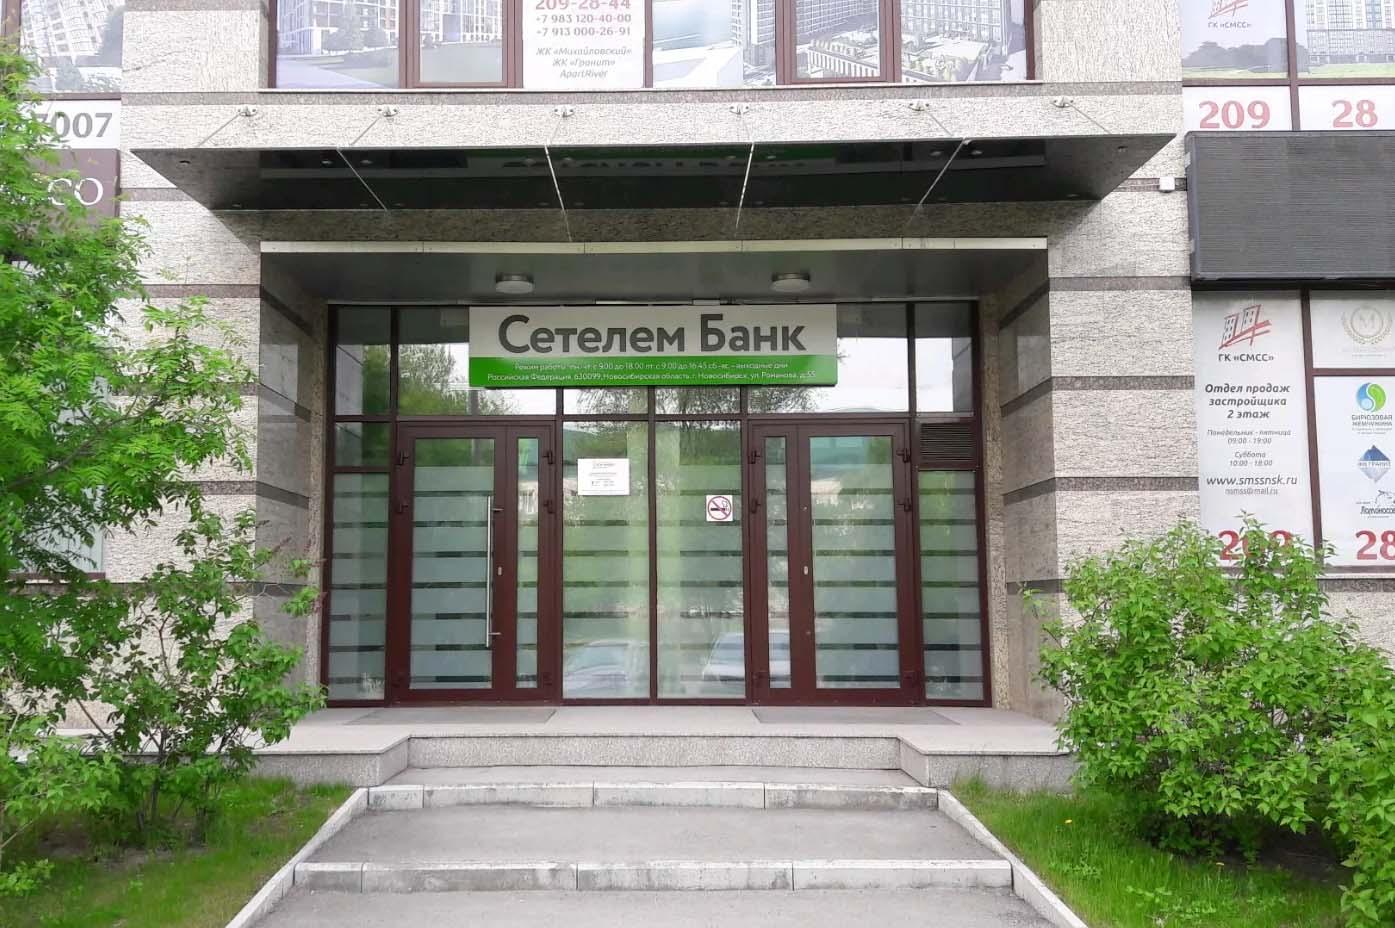 Сетелем банк